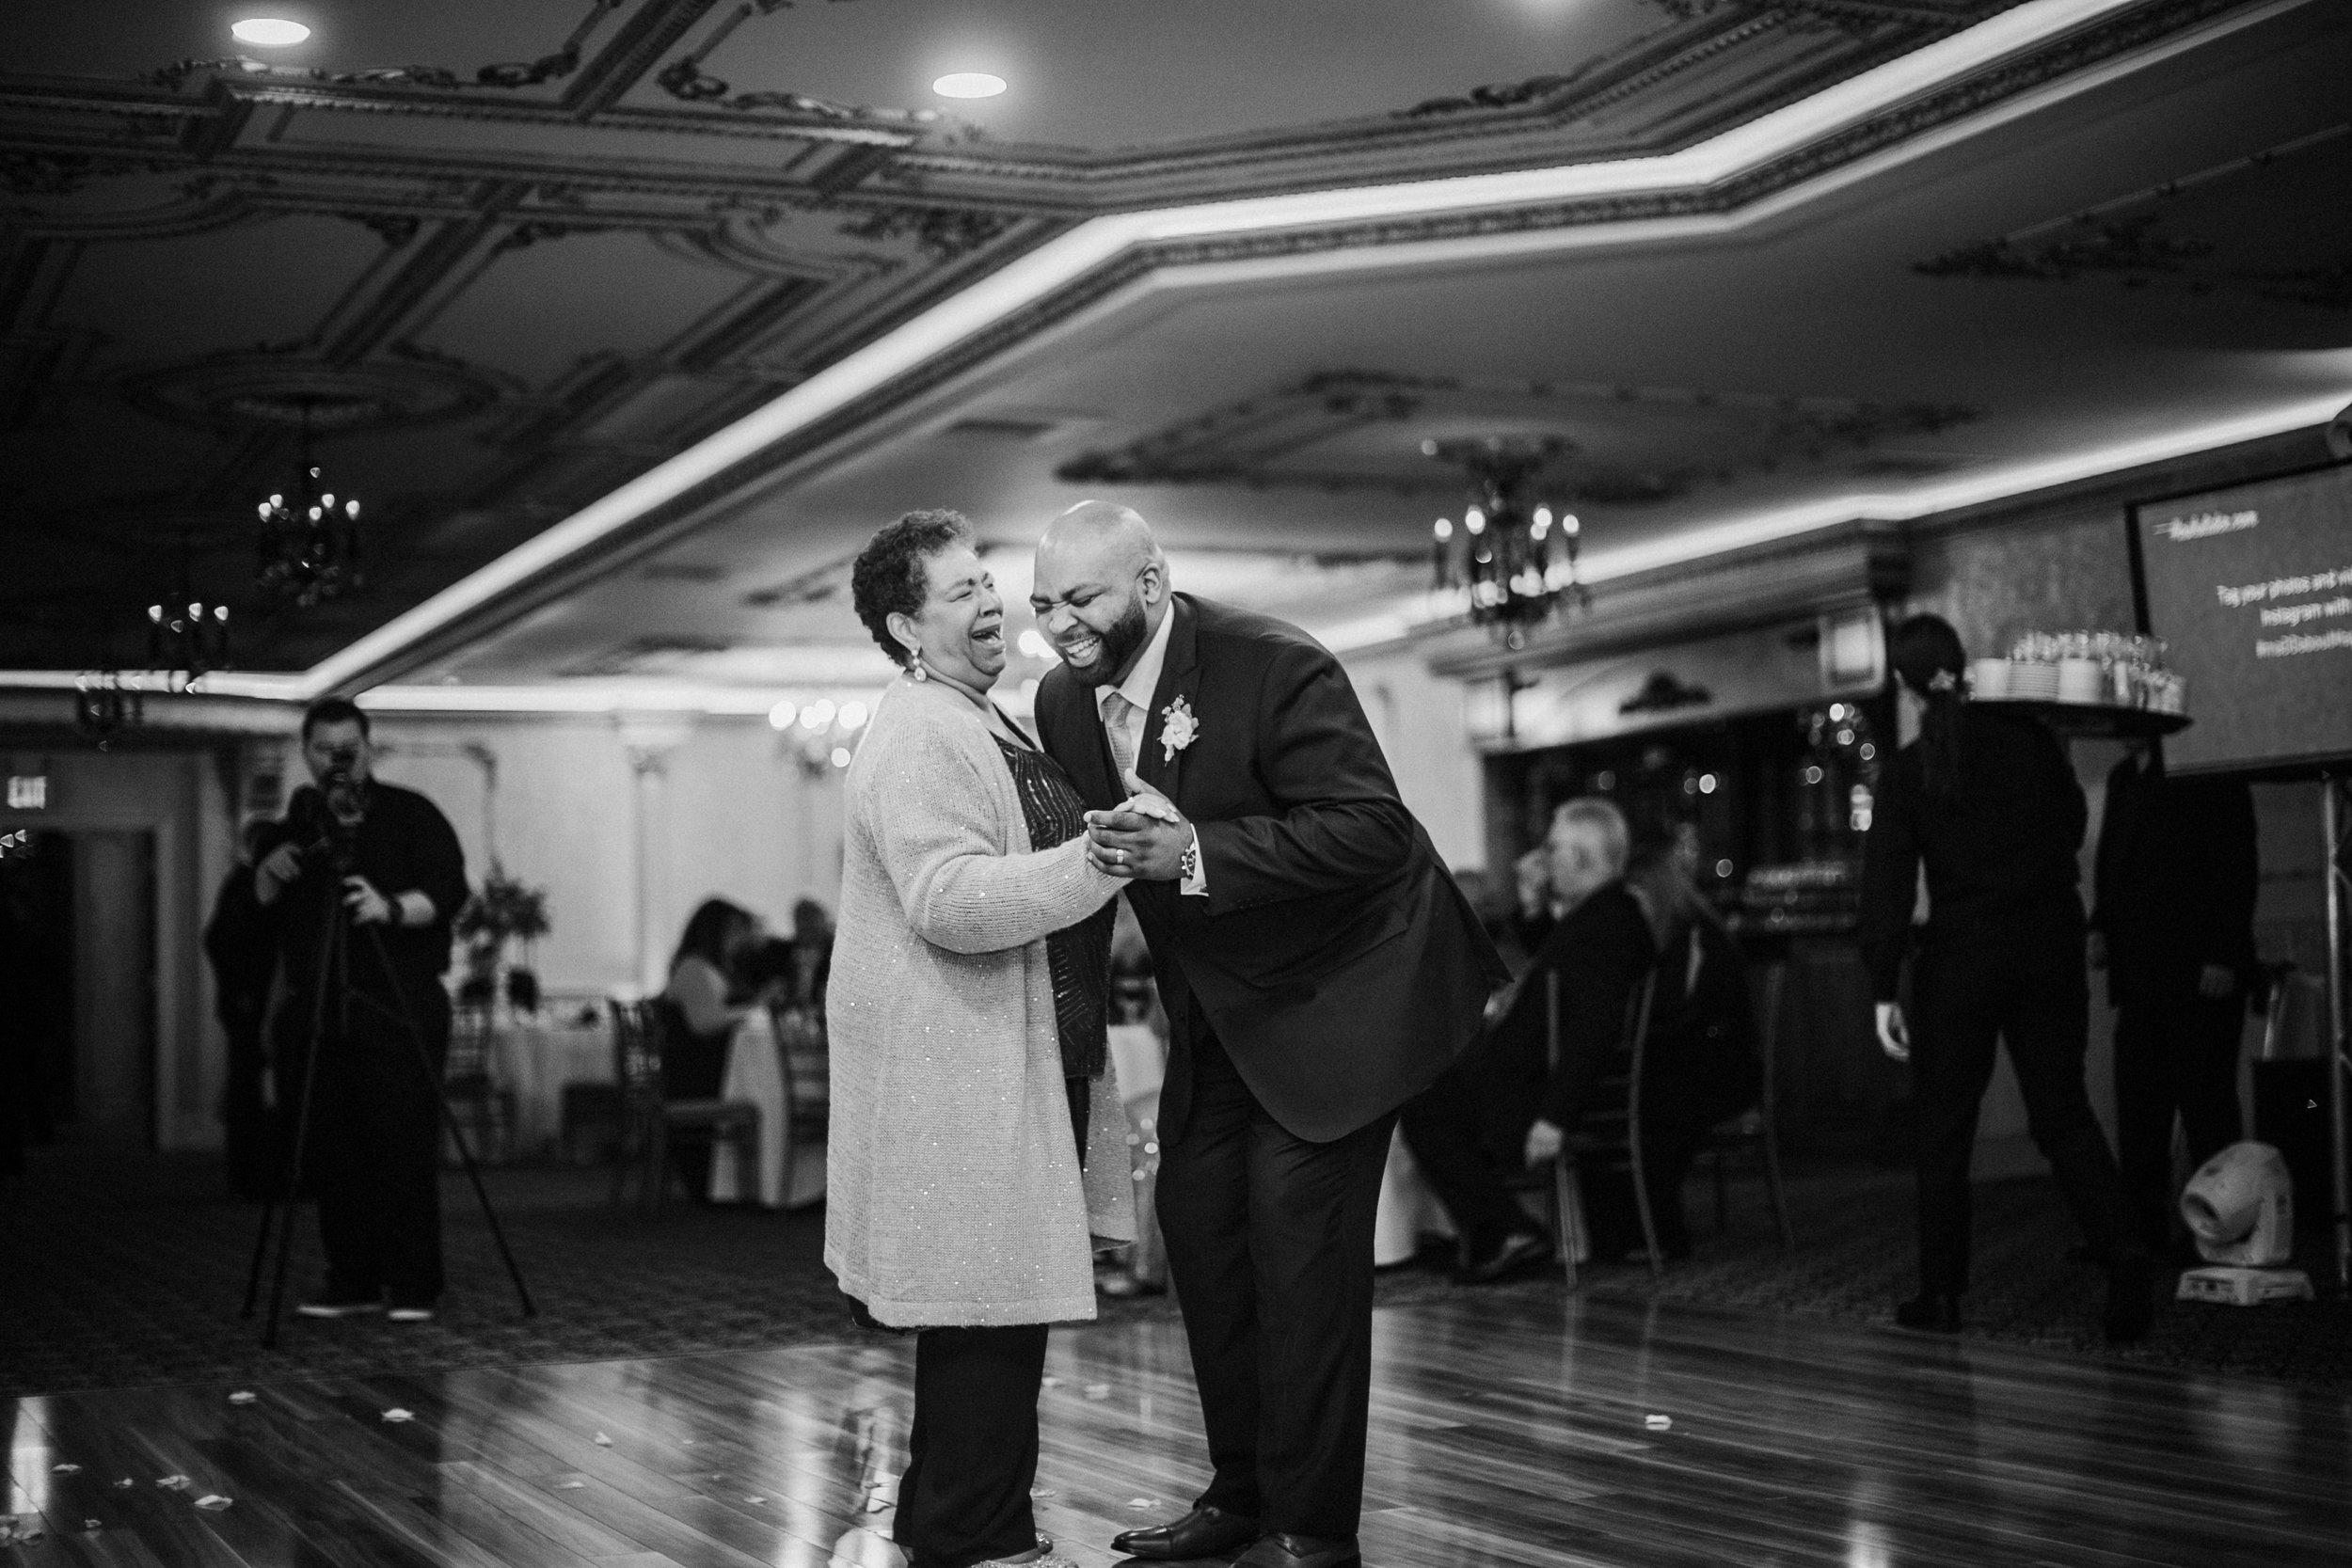 New-Jersey-Wedding-Photography-Brigalias-Deanna&Darryl-Reception-BW-106.jpg